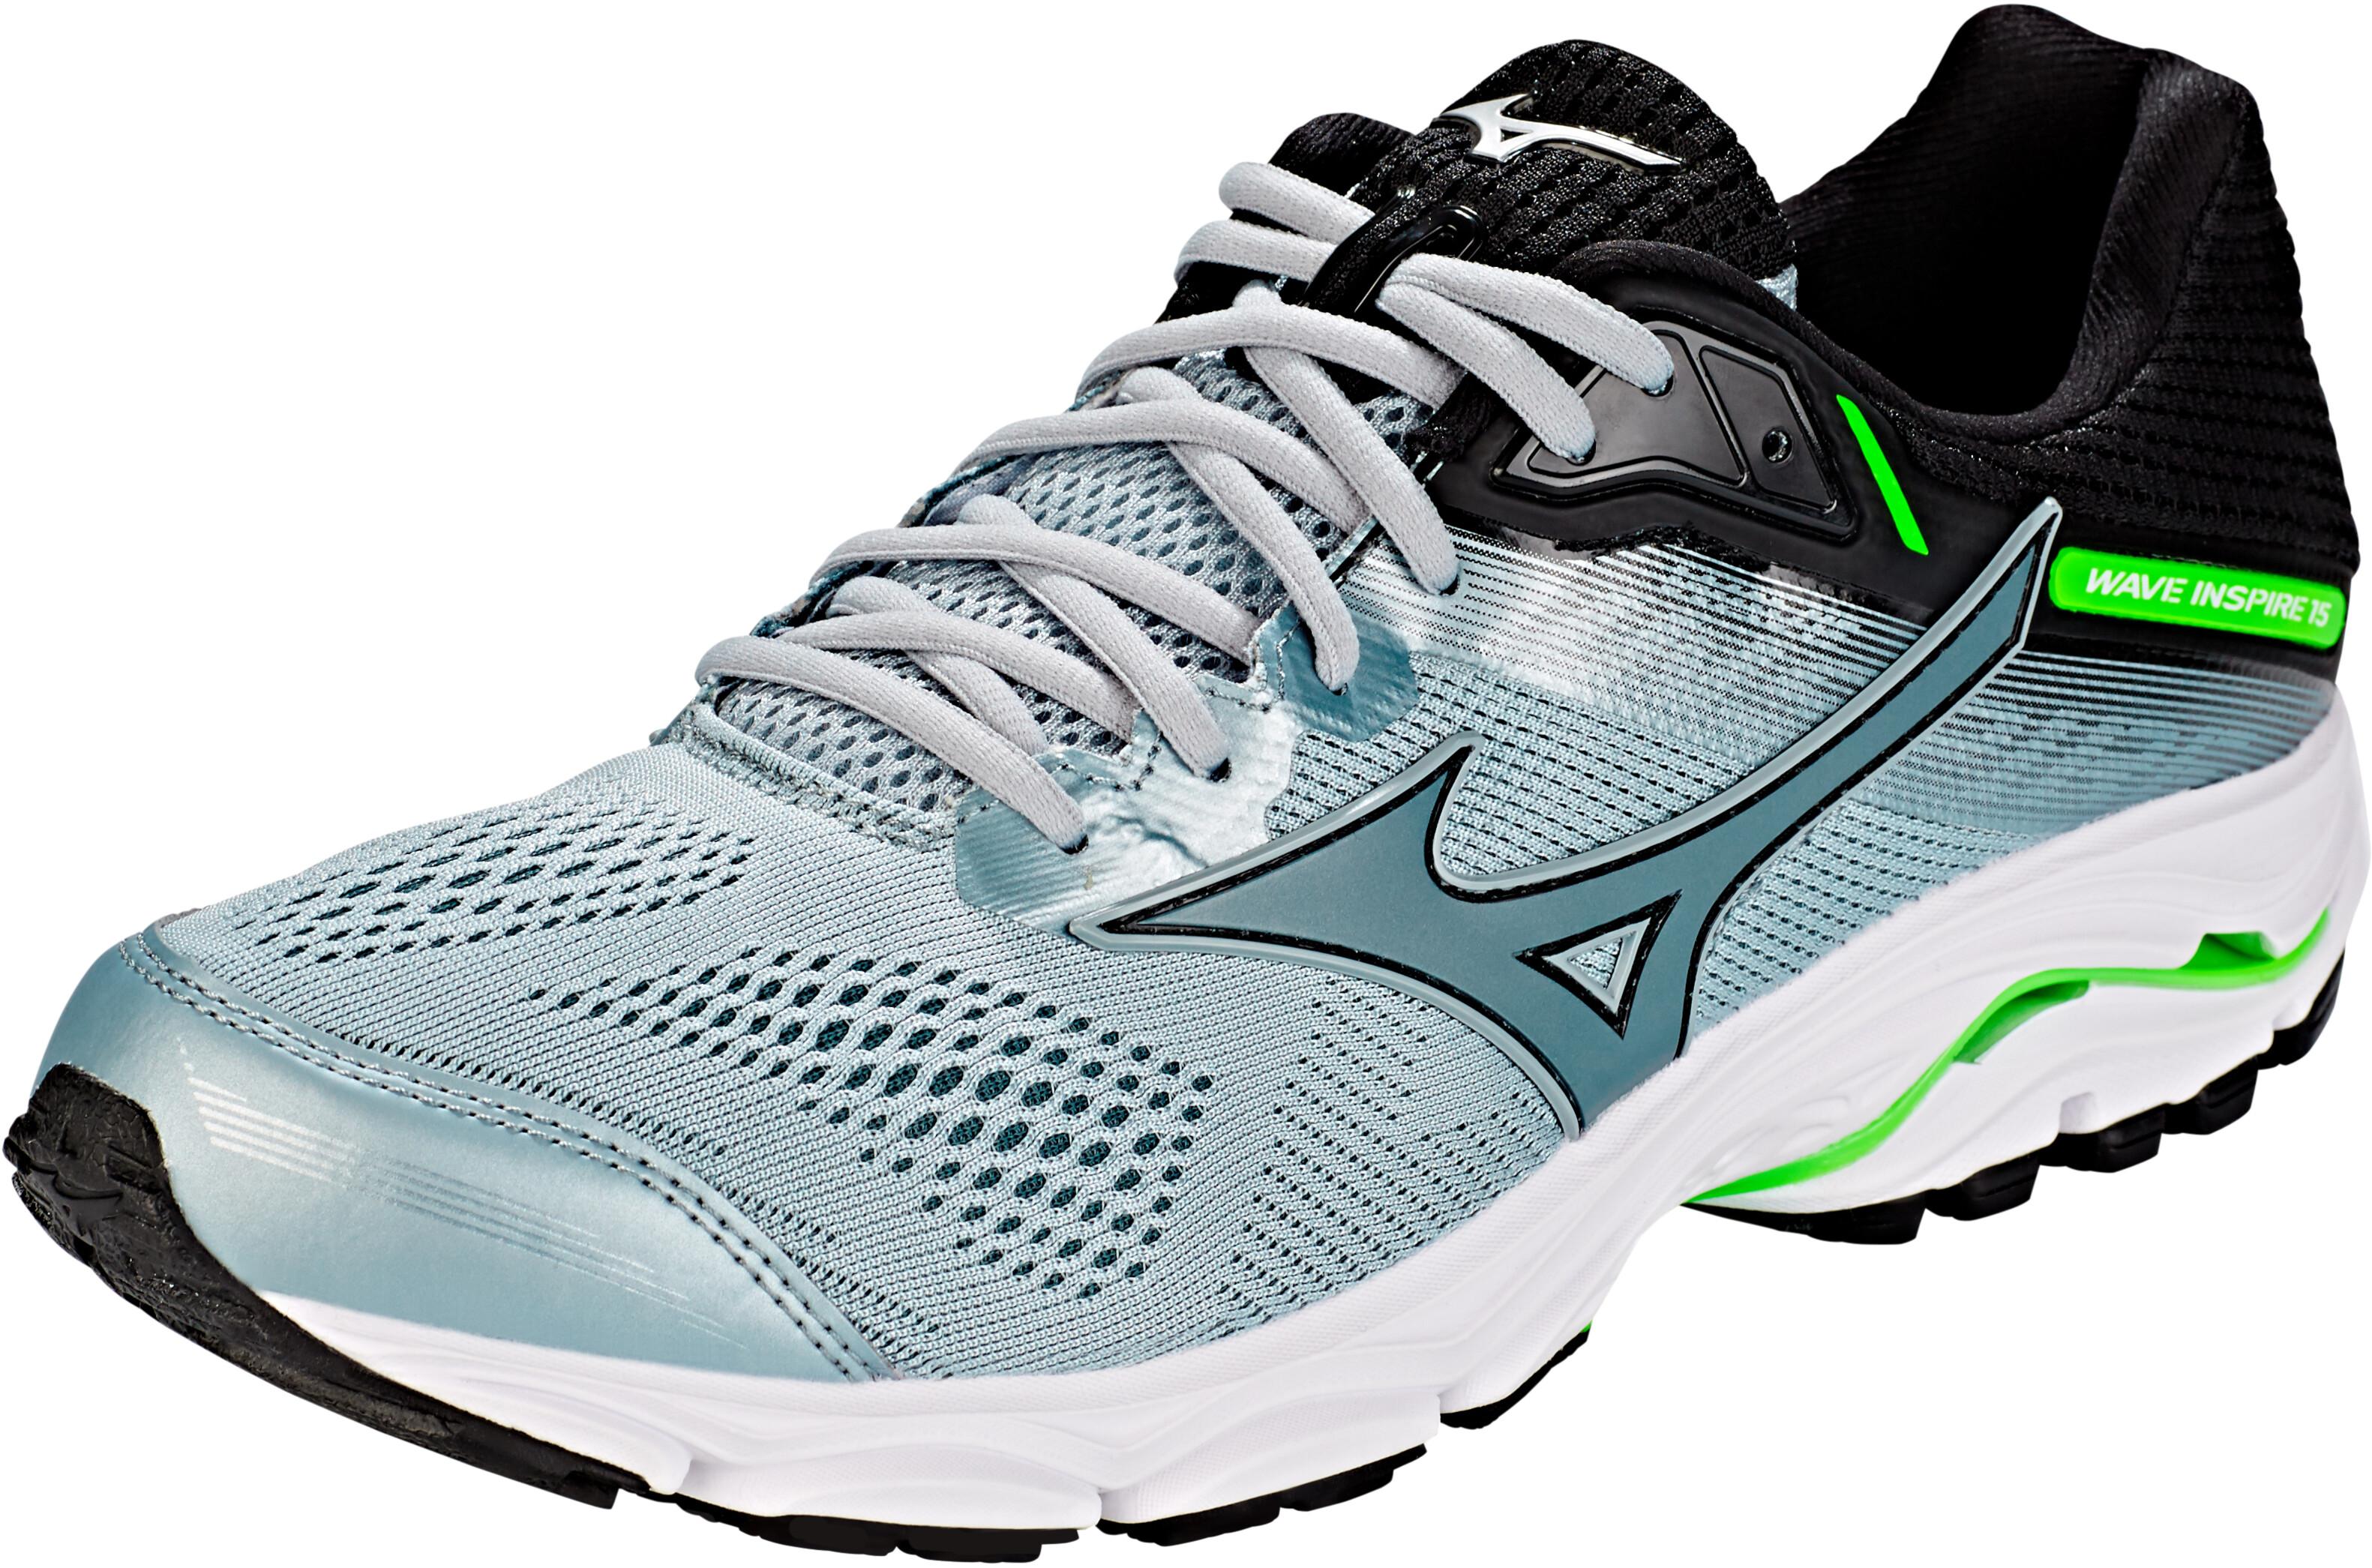 18855d32efe7 Mizuno Wave Inspire 15 Running Shoes Men grey green at Addnature.co.uk